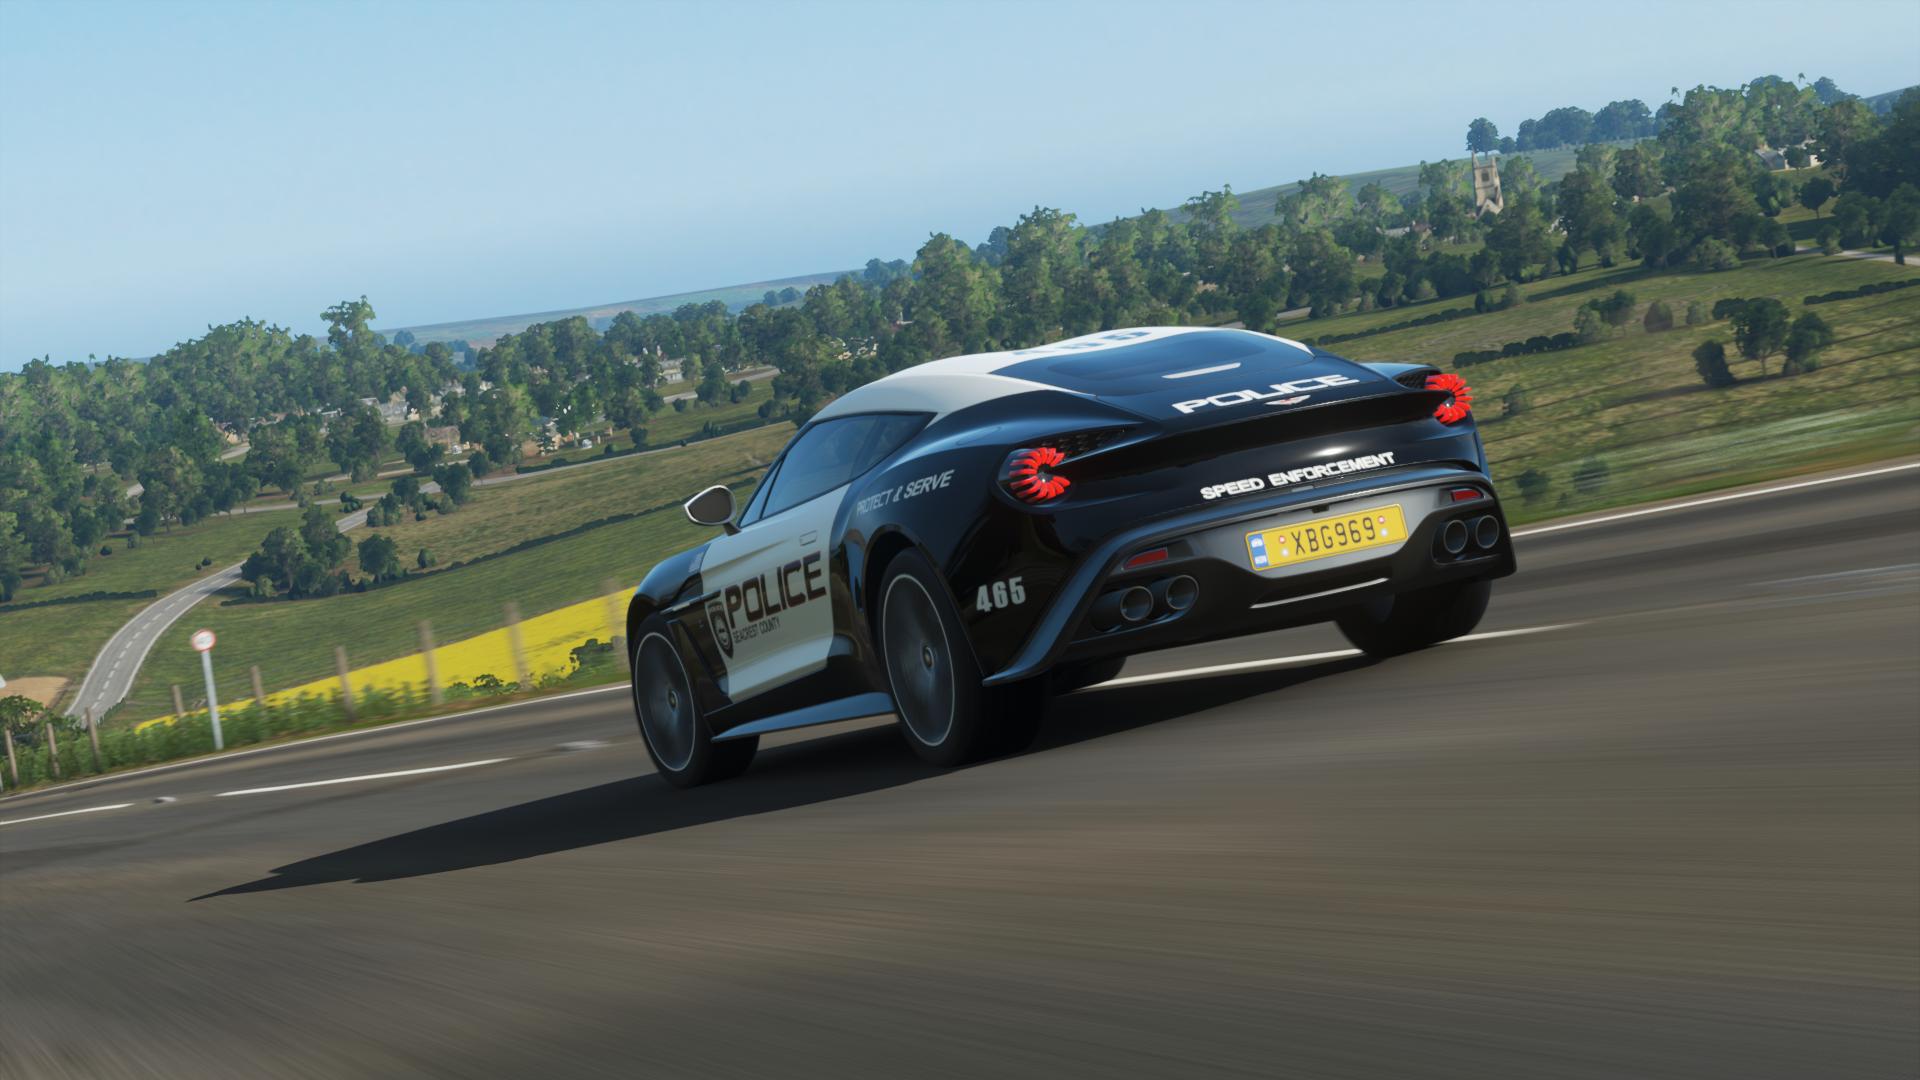 Scpd 2017 Aston Martin Vanquish Zagato Rear By Xboxgamer969 On Deviantart